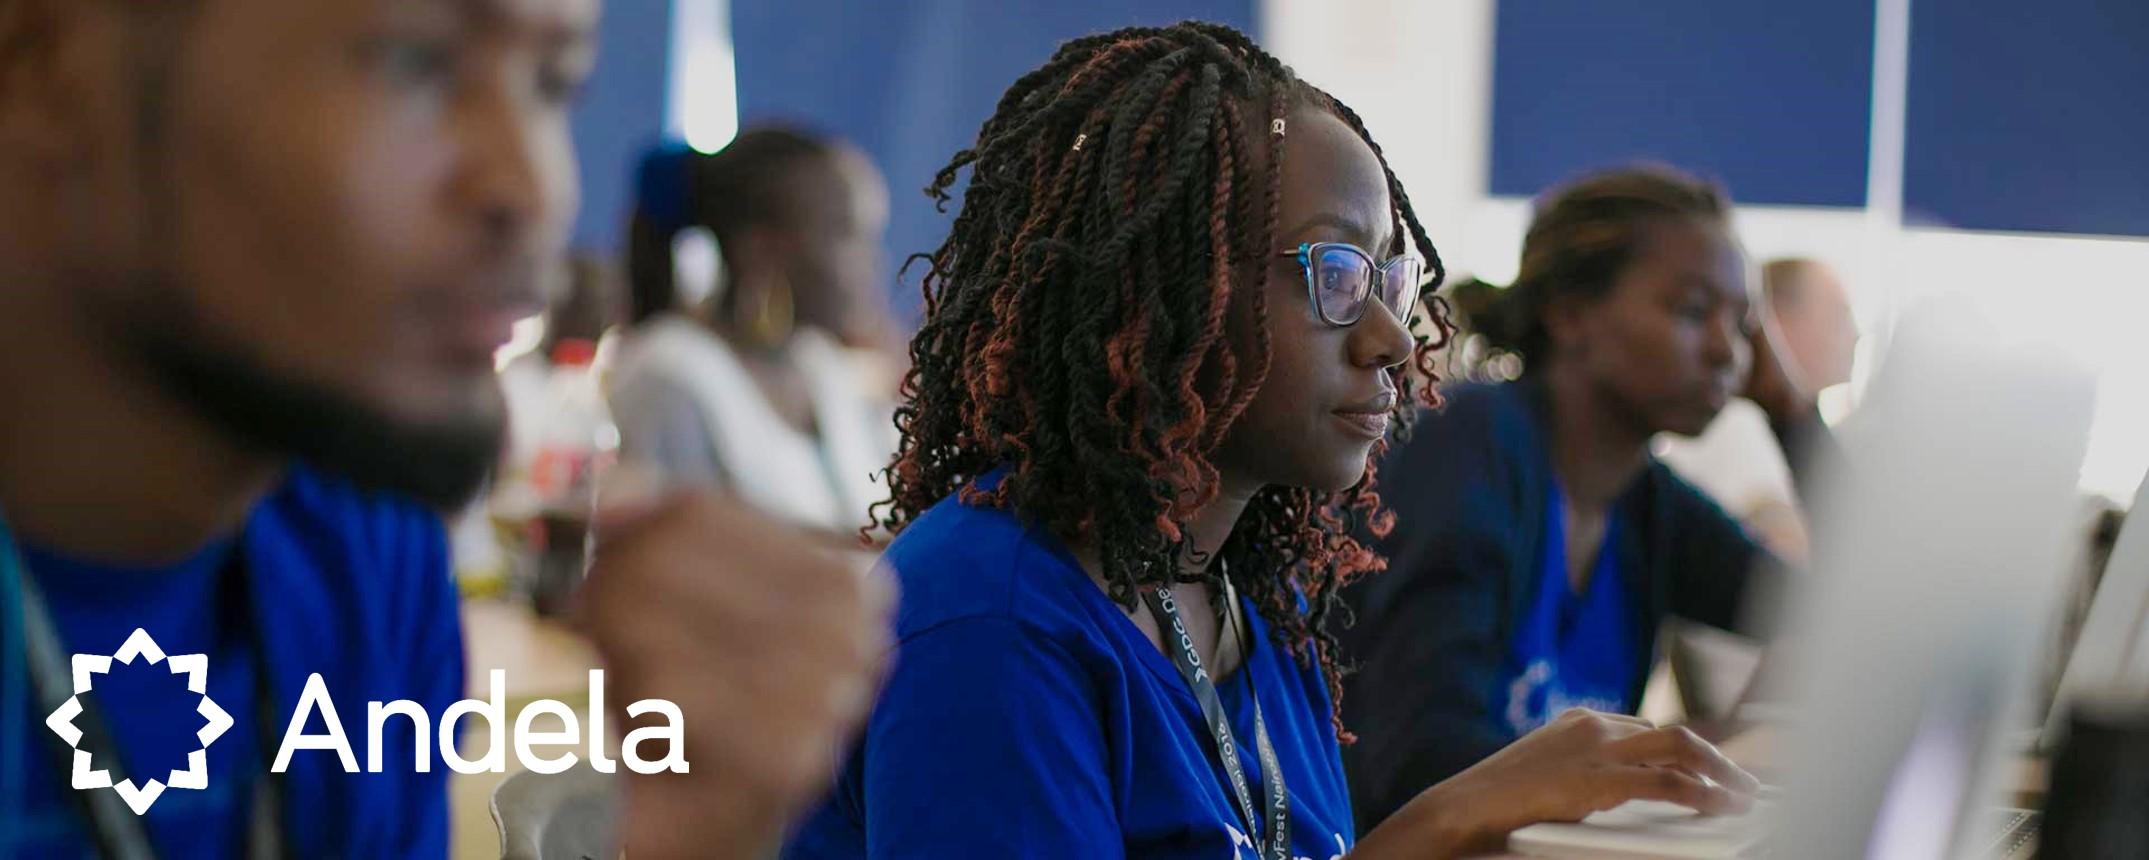 Andela - Program Leadership opportunity Movemeback African opportunity cover image